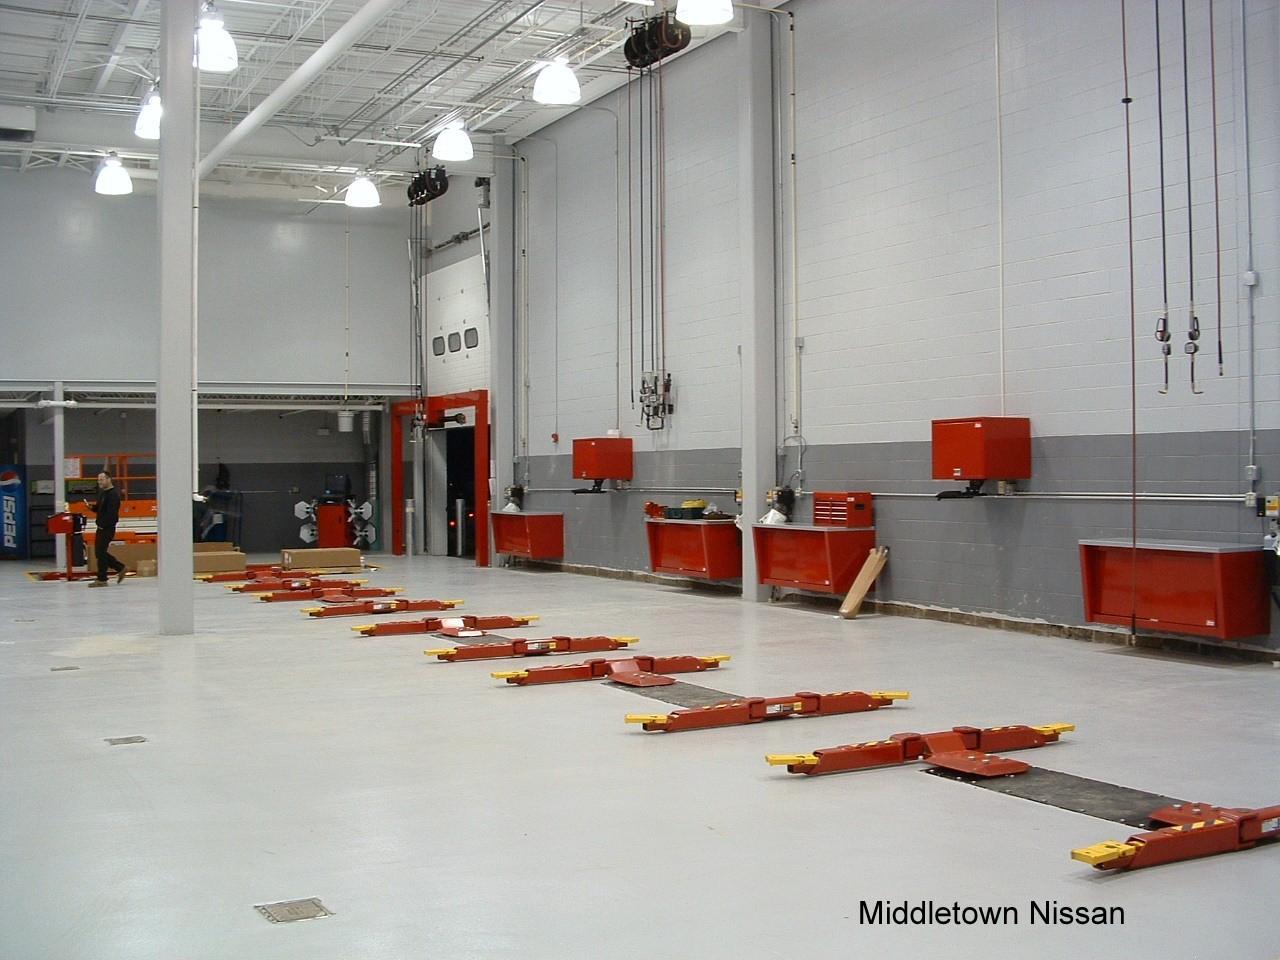 Middletown Nissan 2